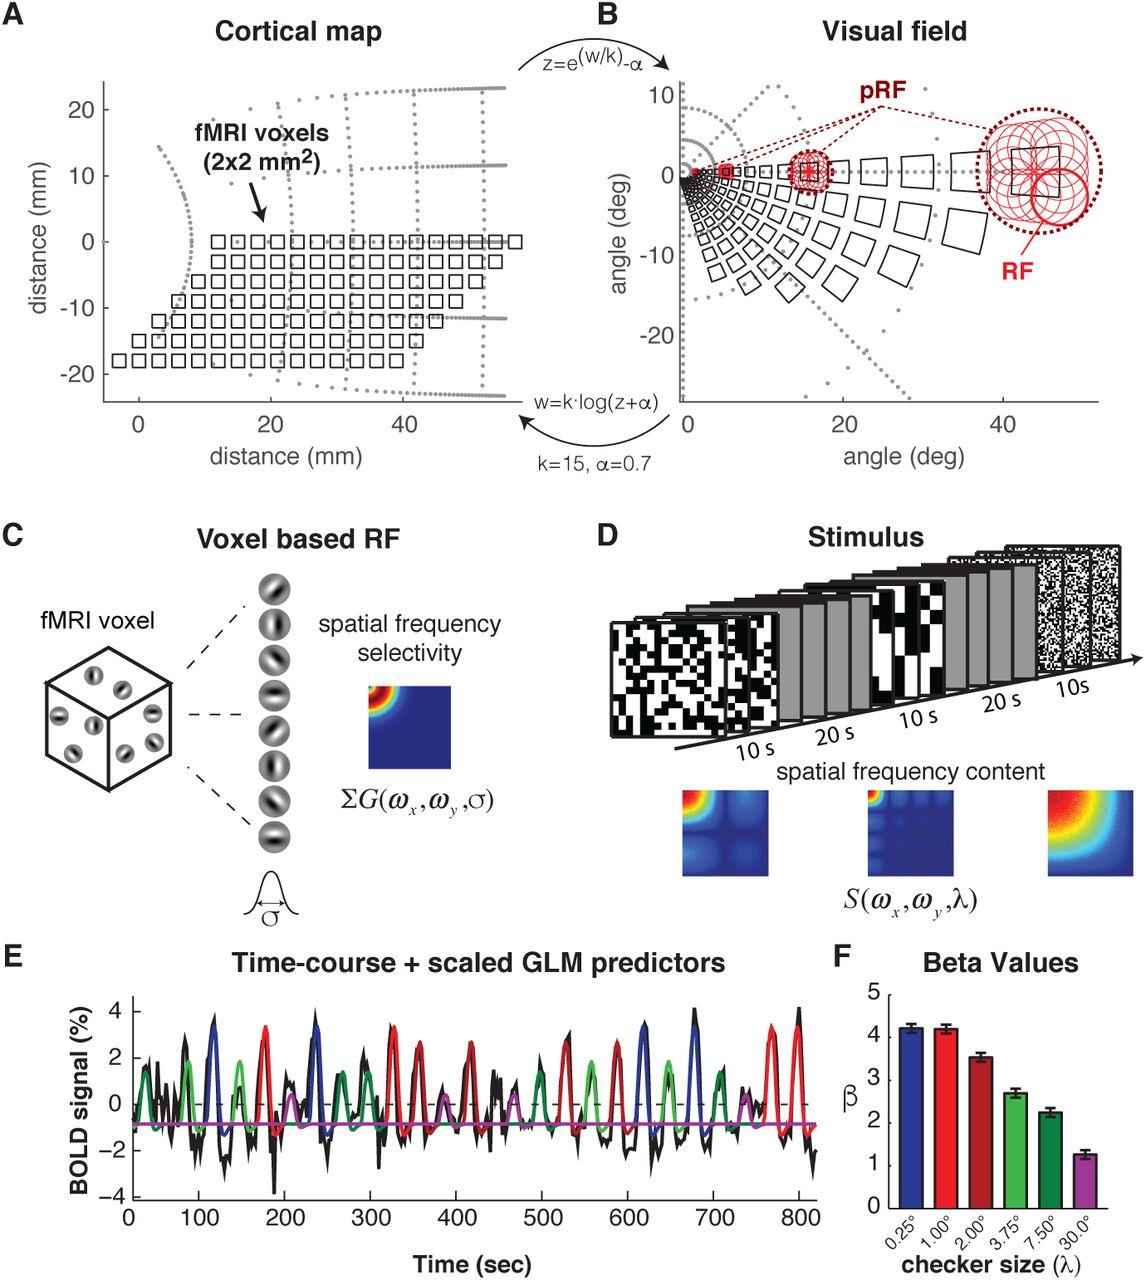 Measuring single neuron visual receptive field sizes by fMRI